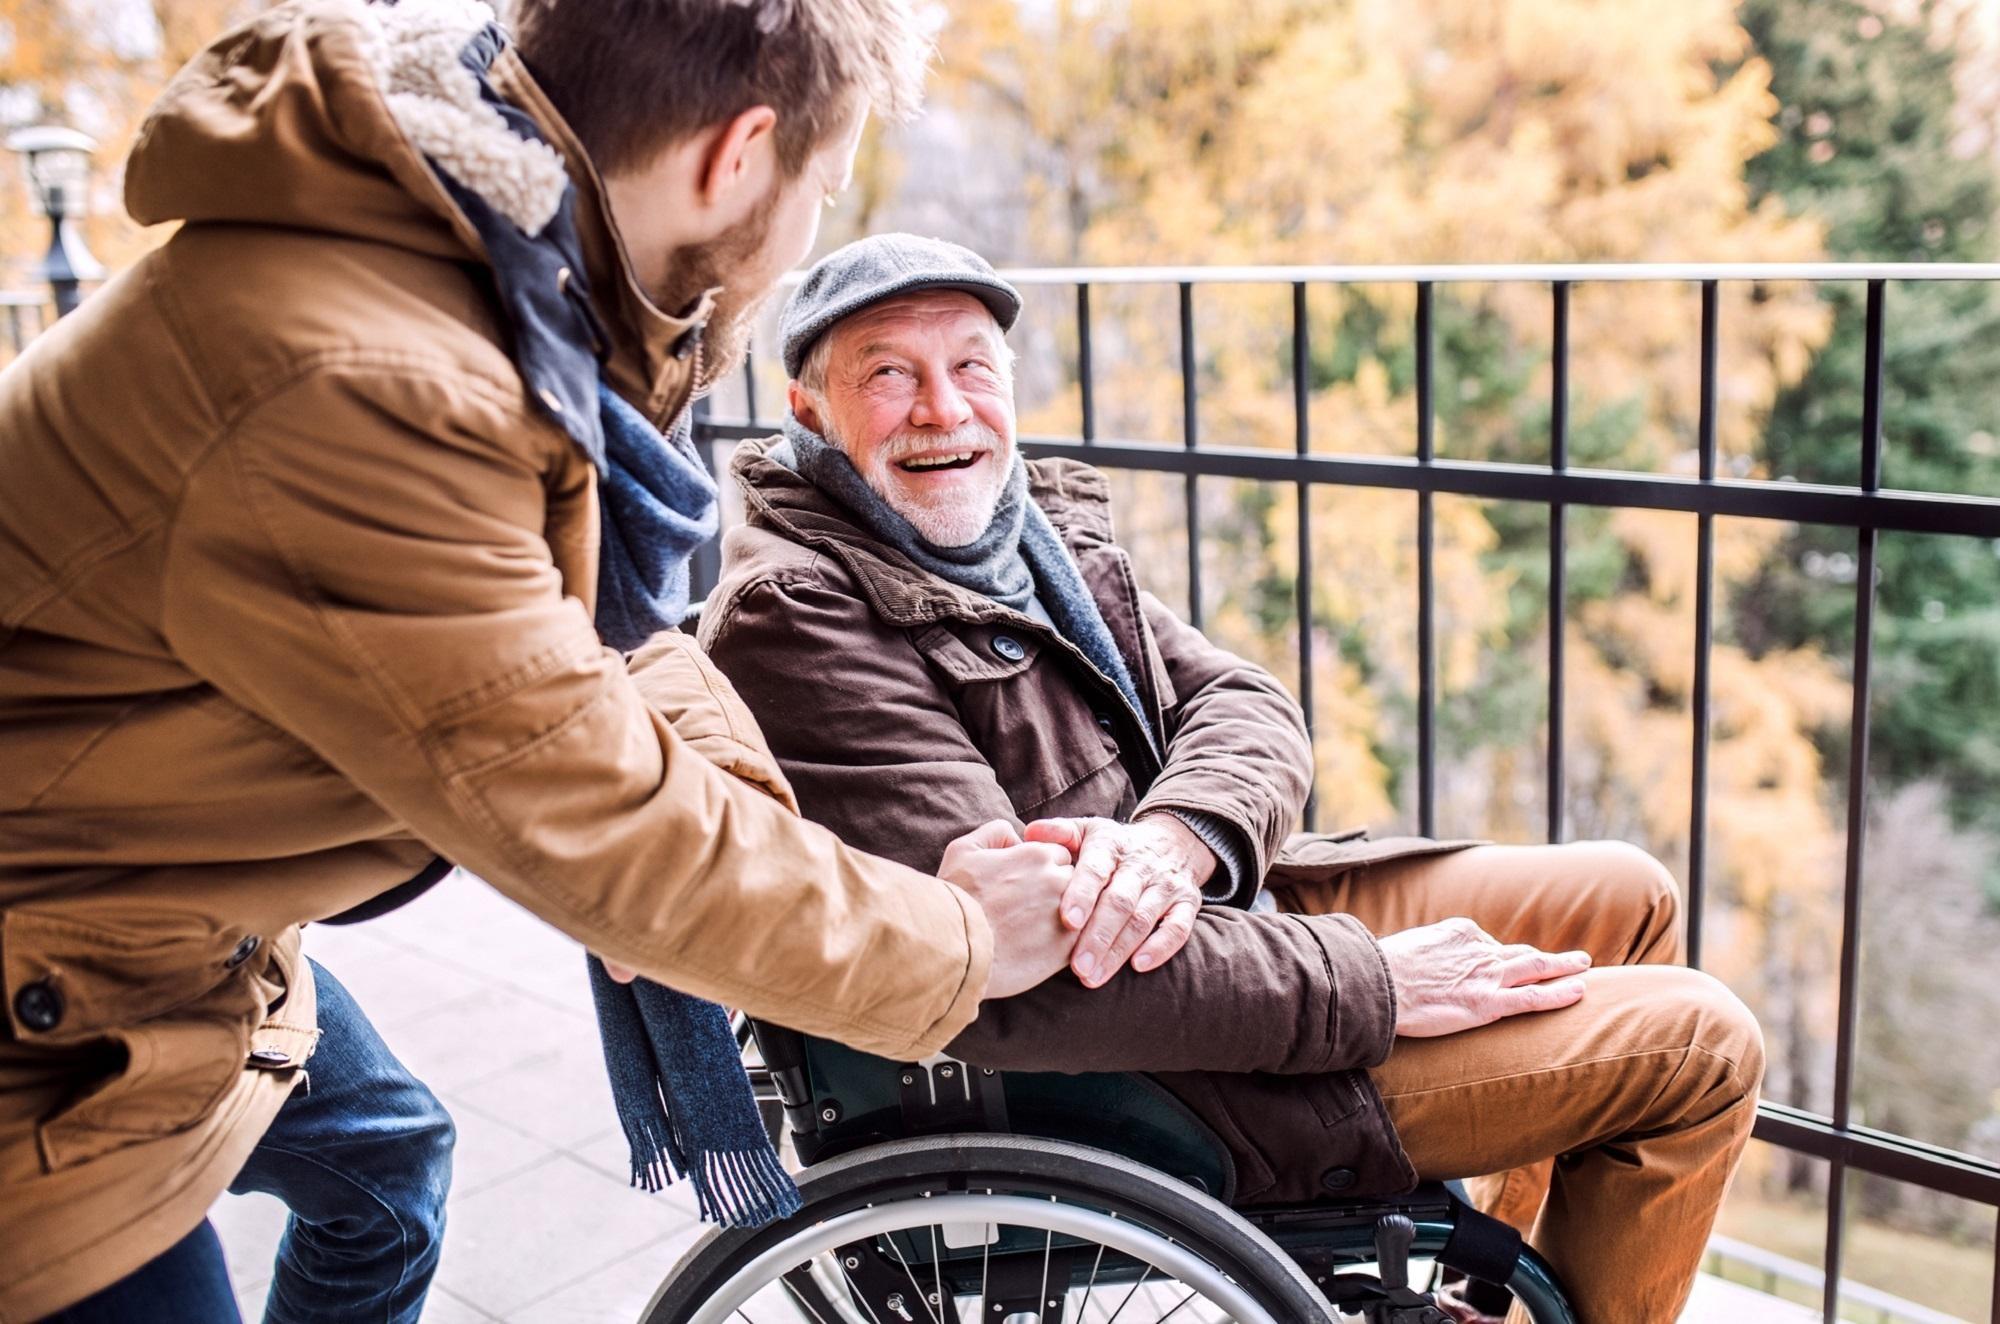 An older man in a wheelchair.